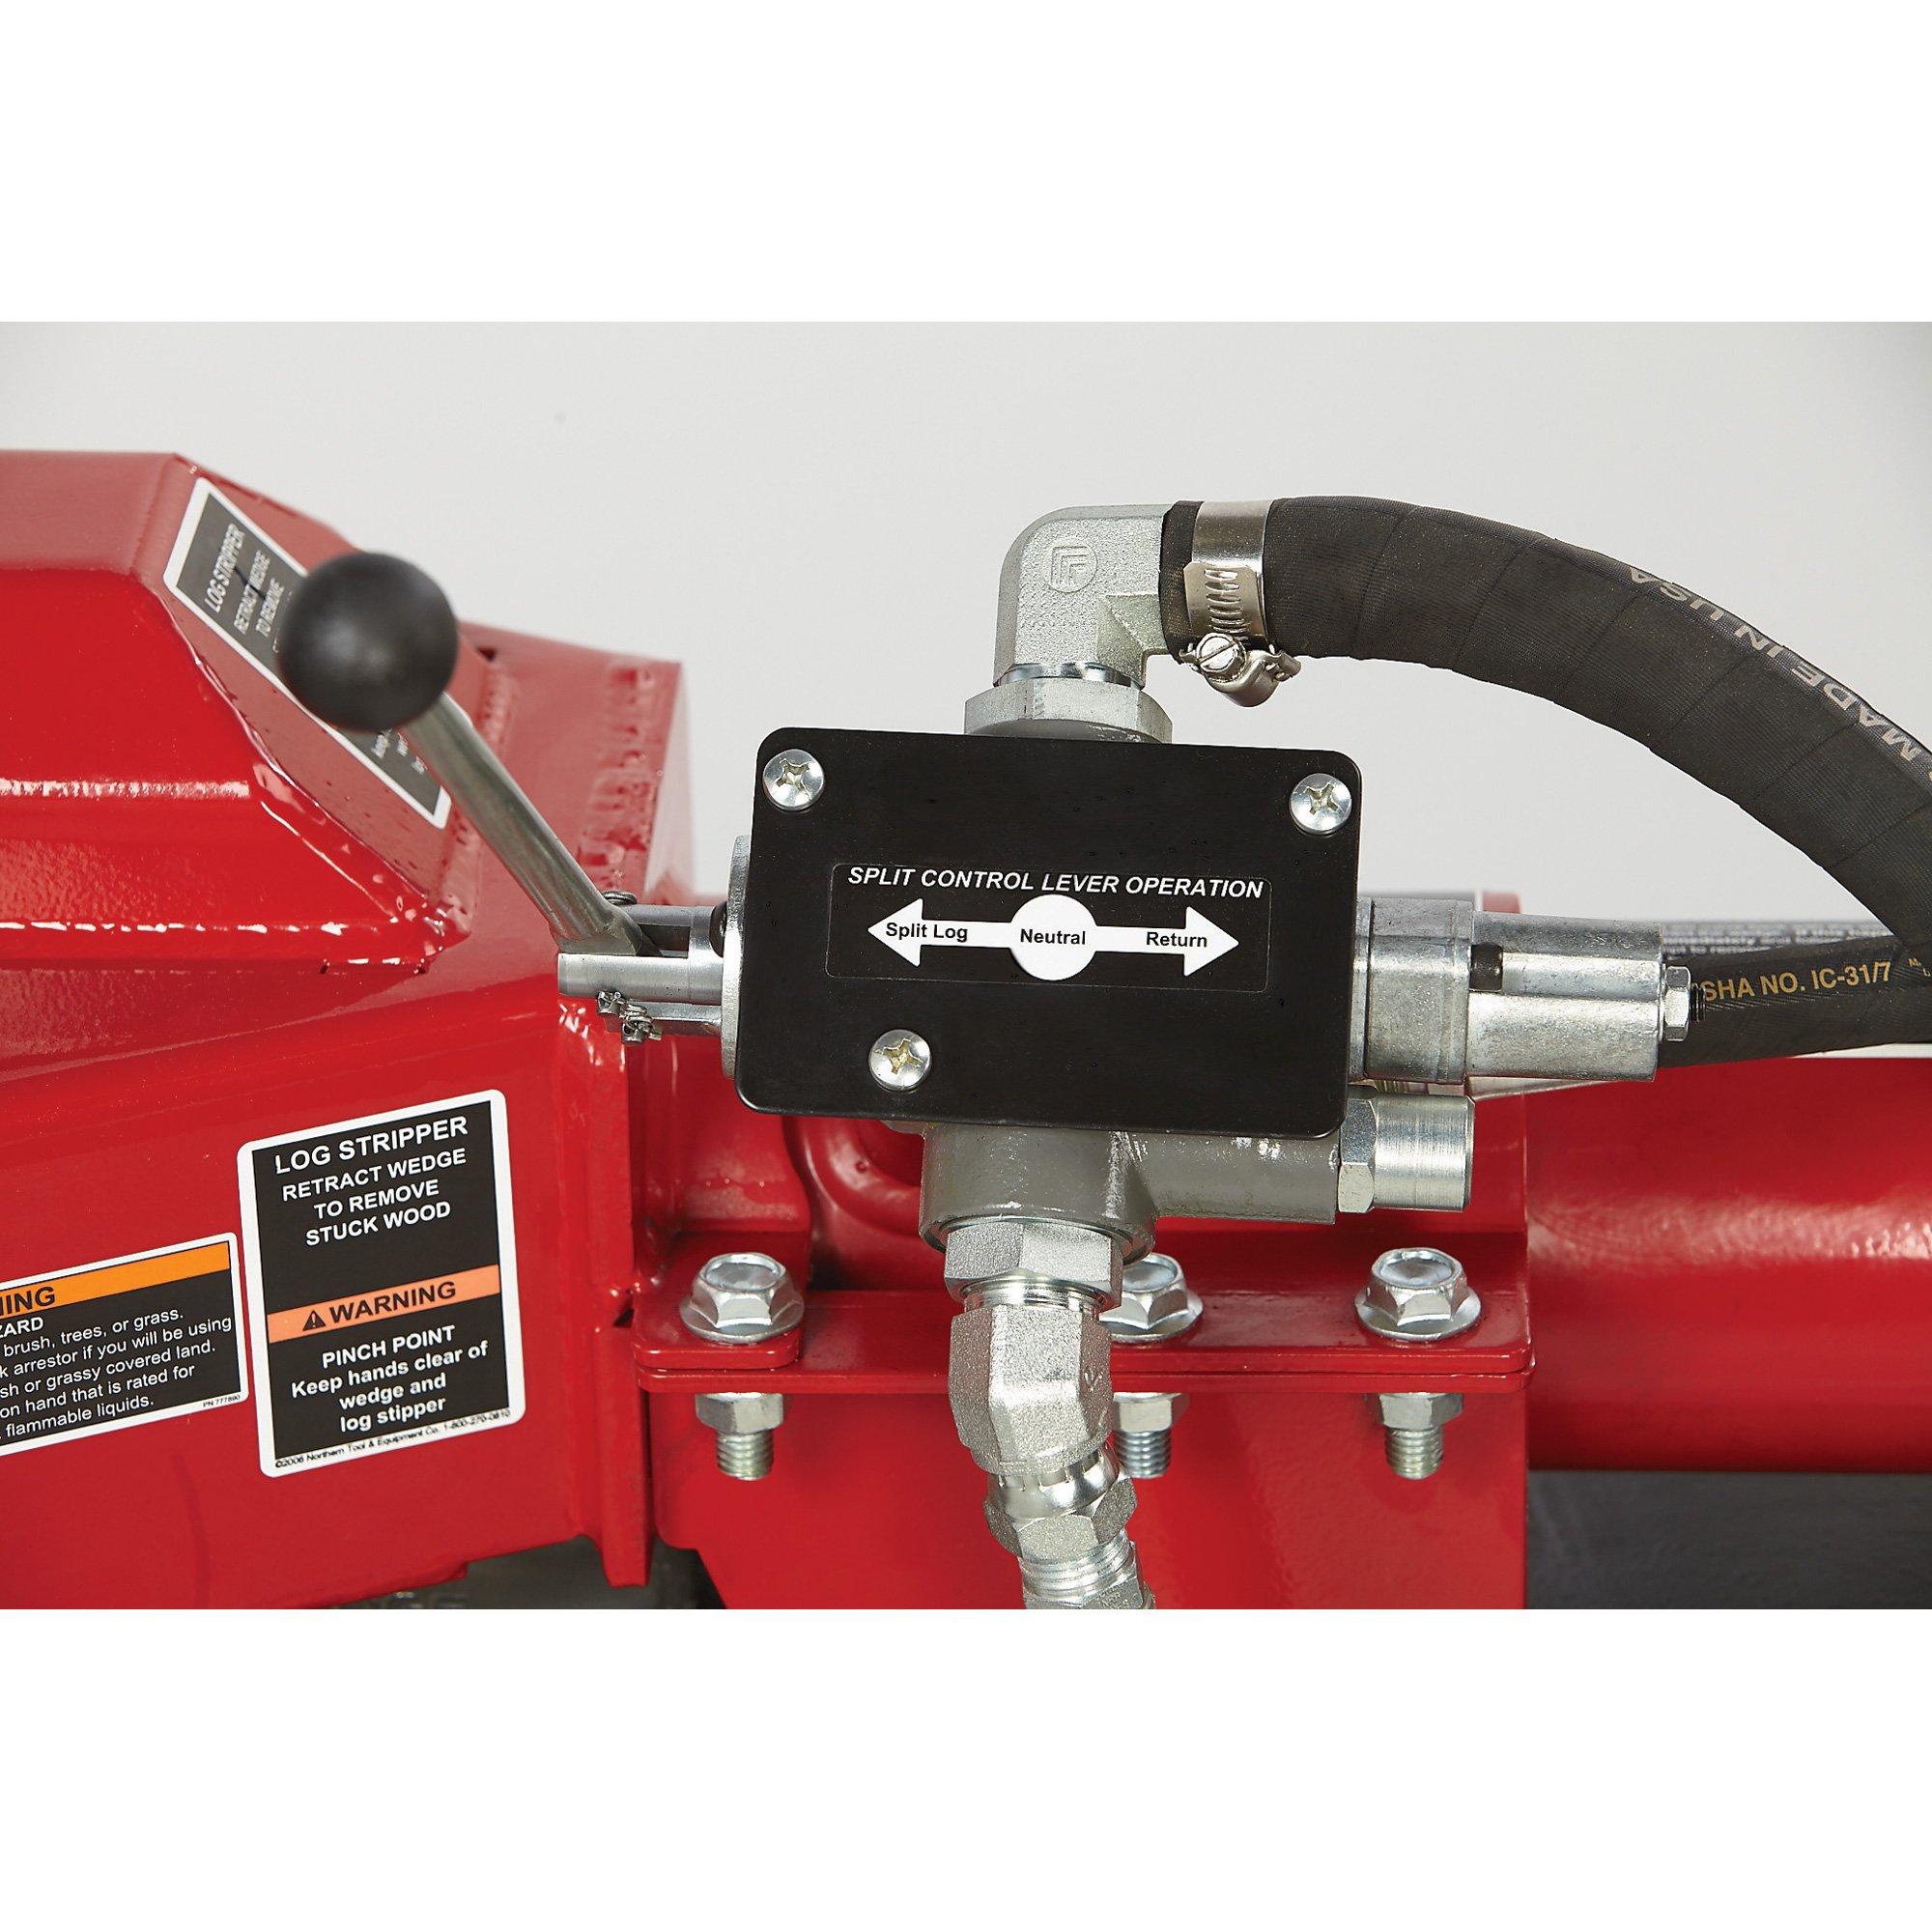 NorthStar Horizontal/Vertical Log Splitter - 24-Ton, 160cc Honda GX160 Engine